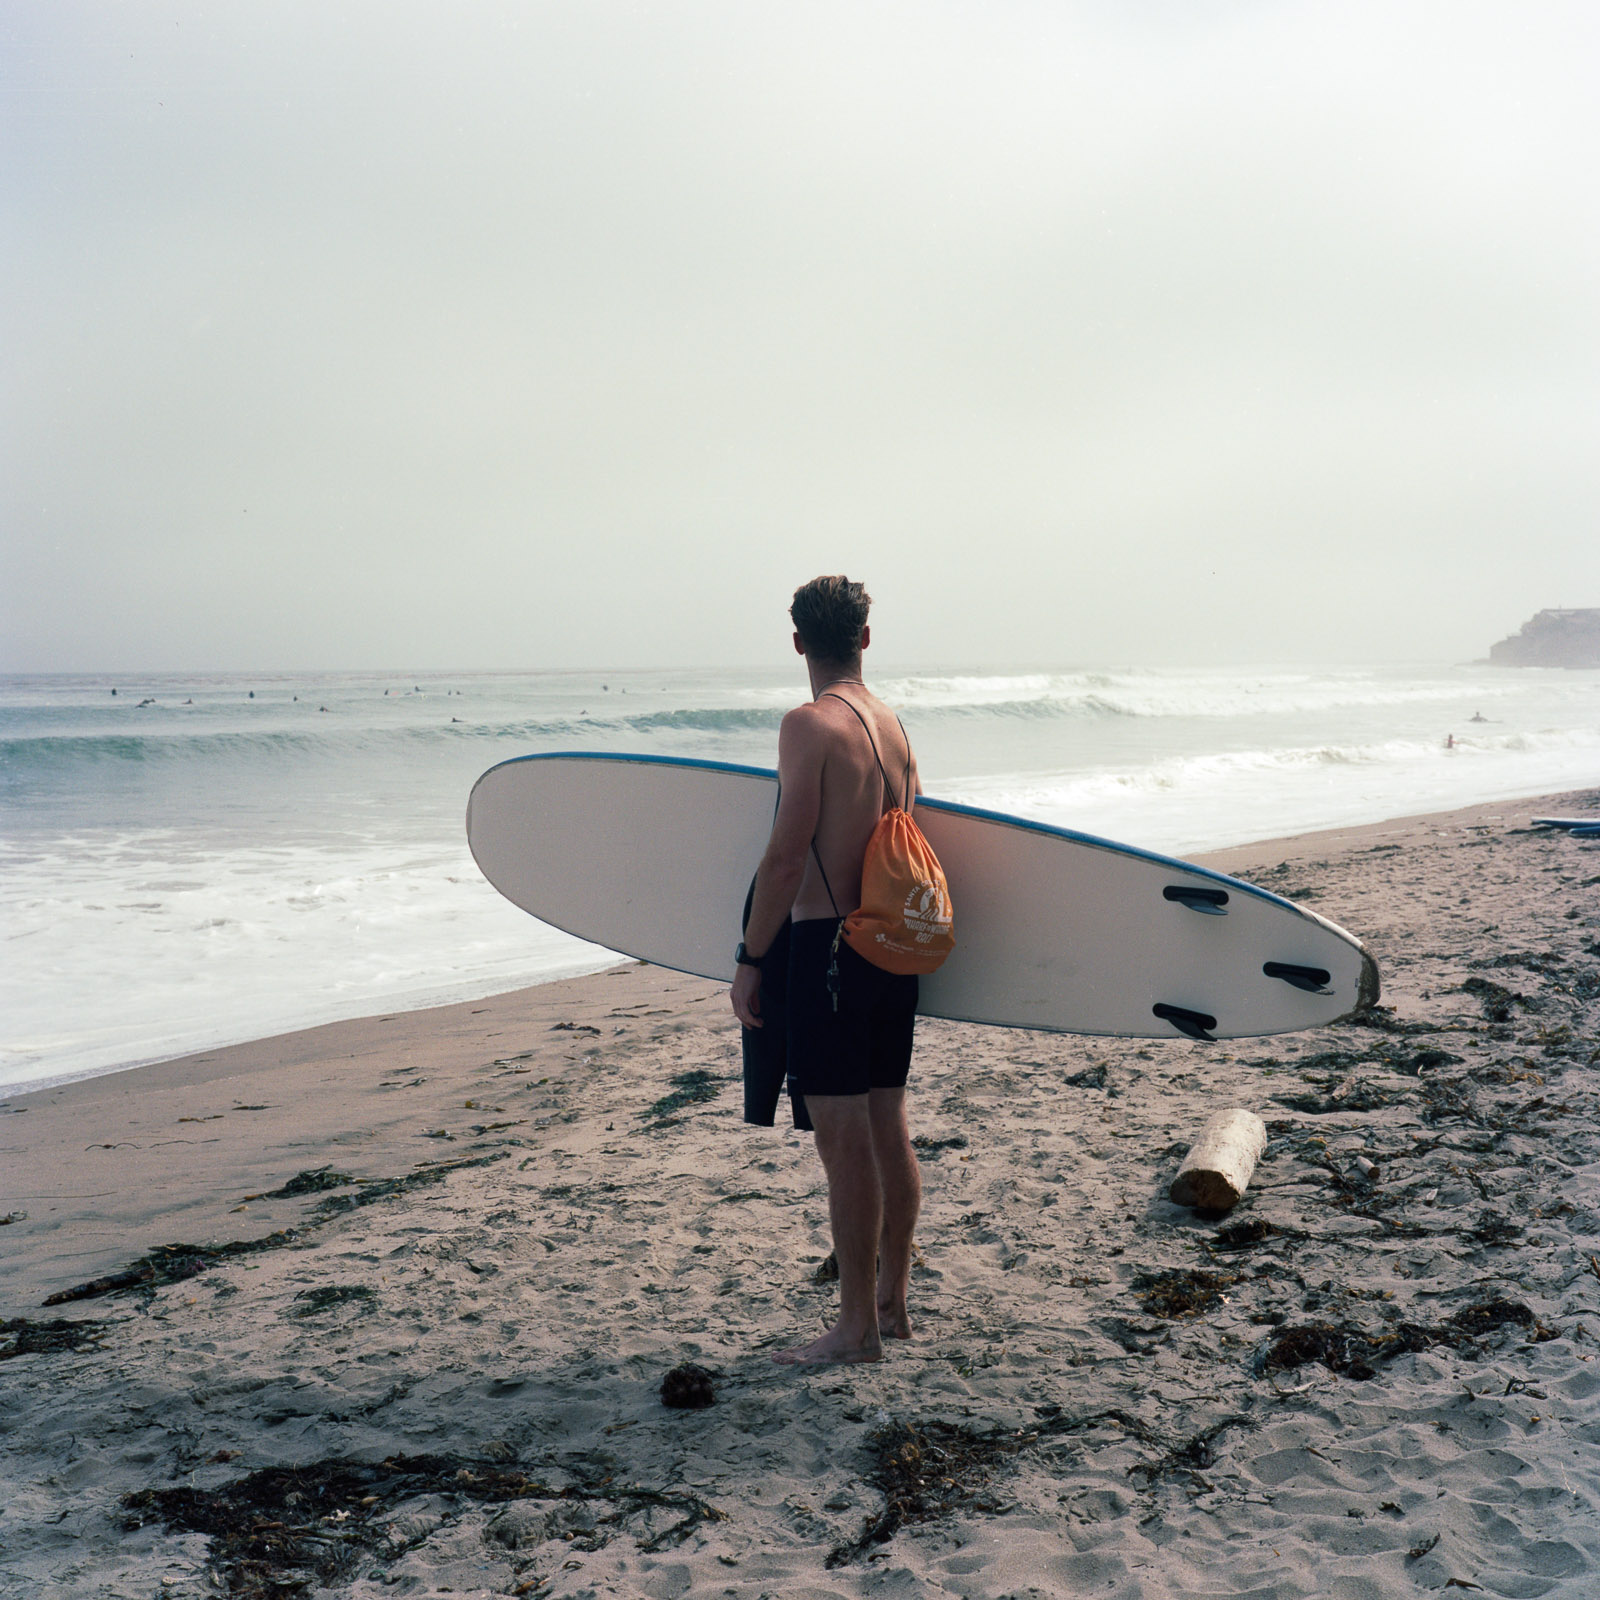 0001-california-travel-8-USA-Portra-160-10.jpg